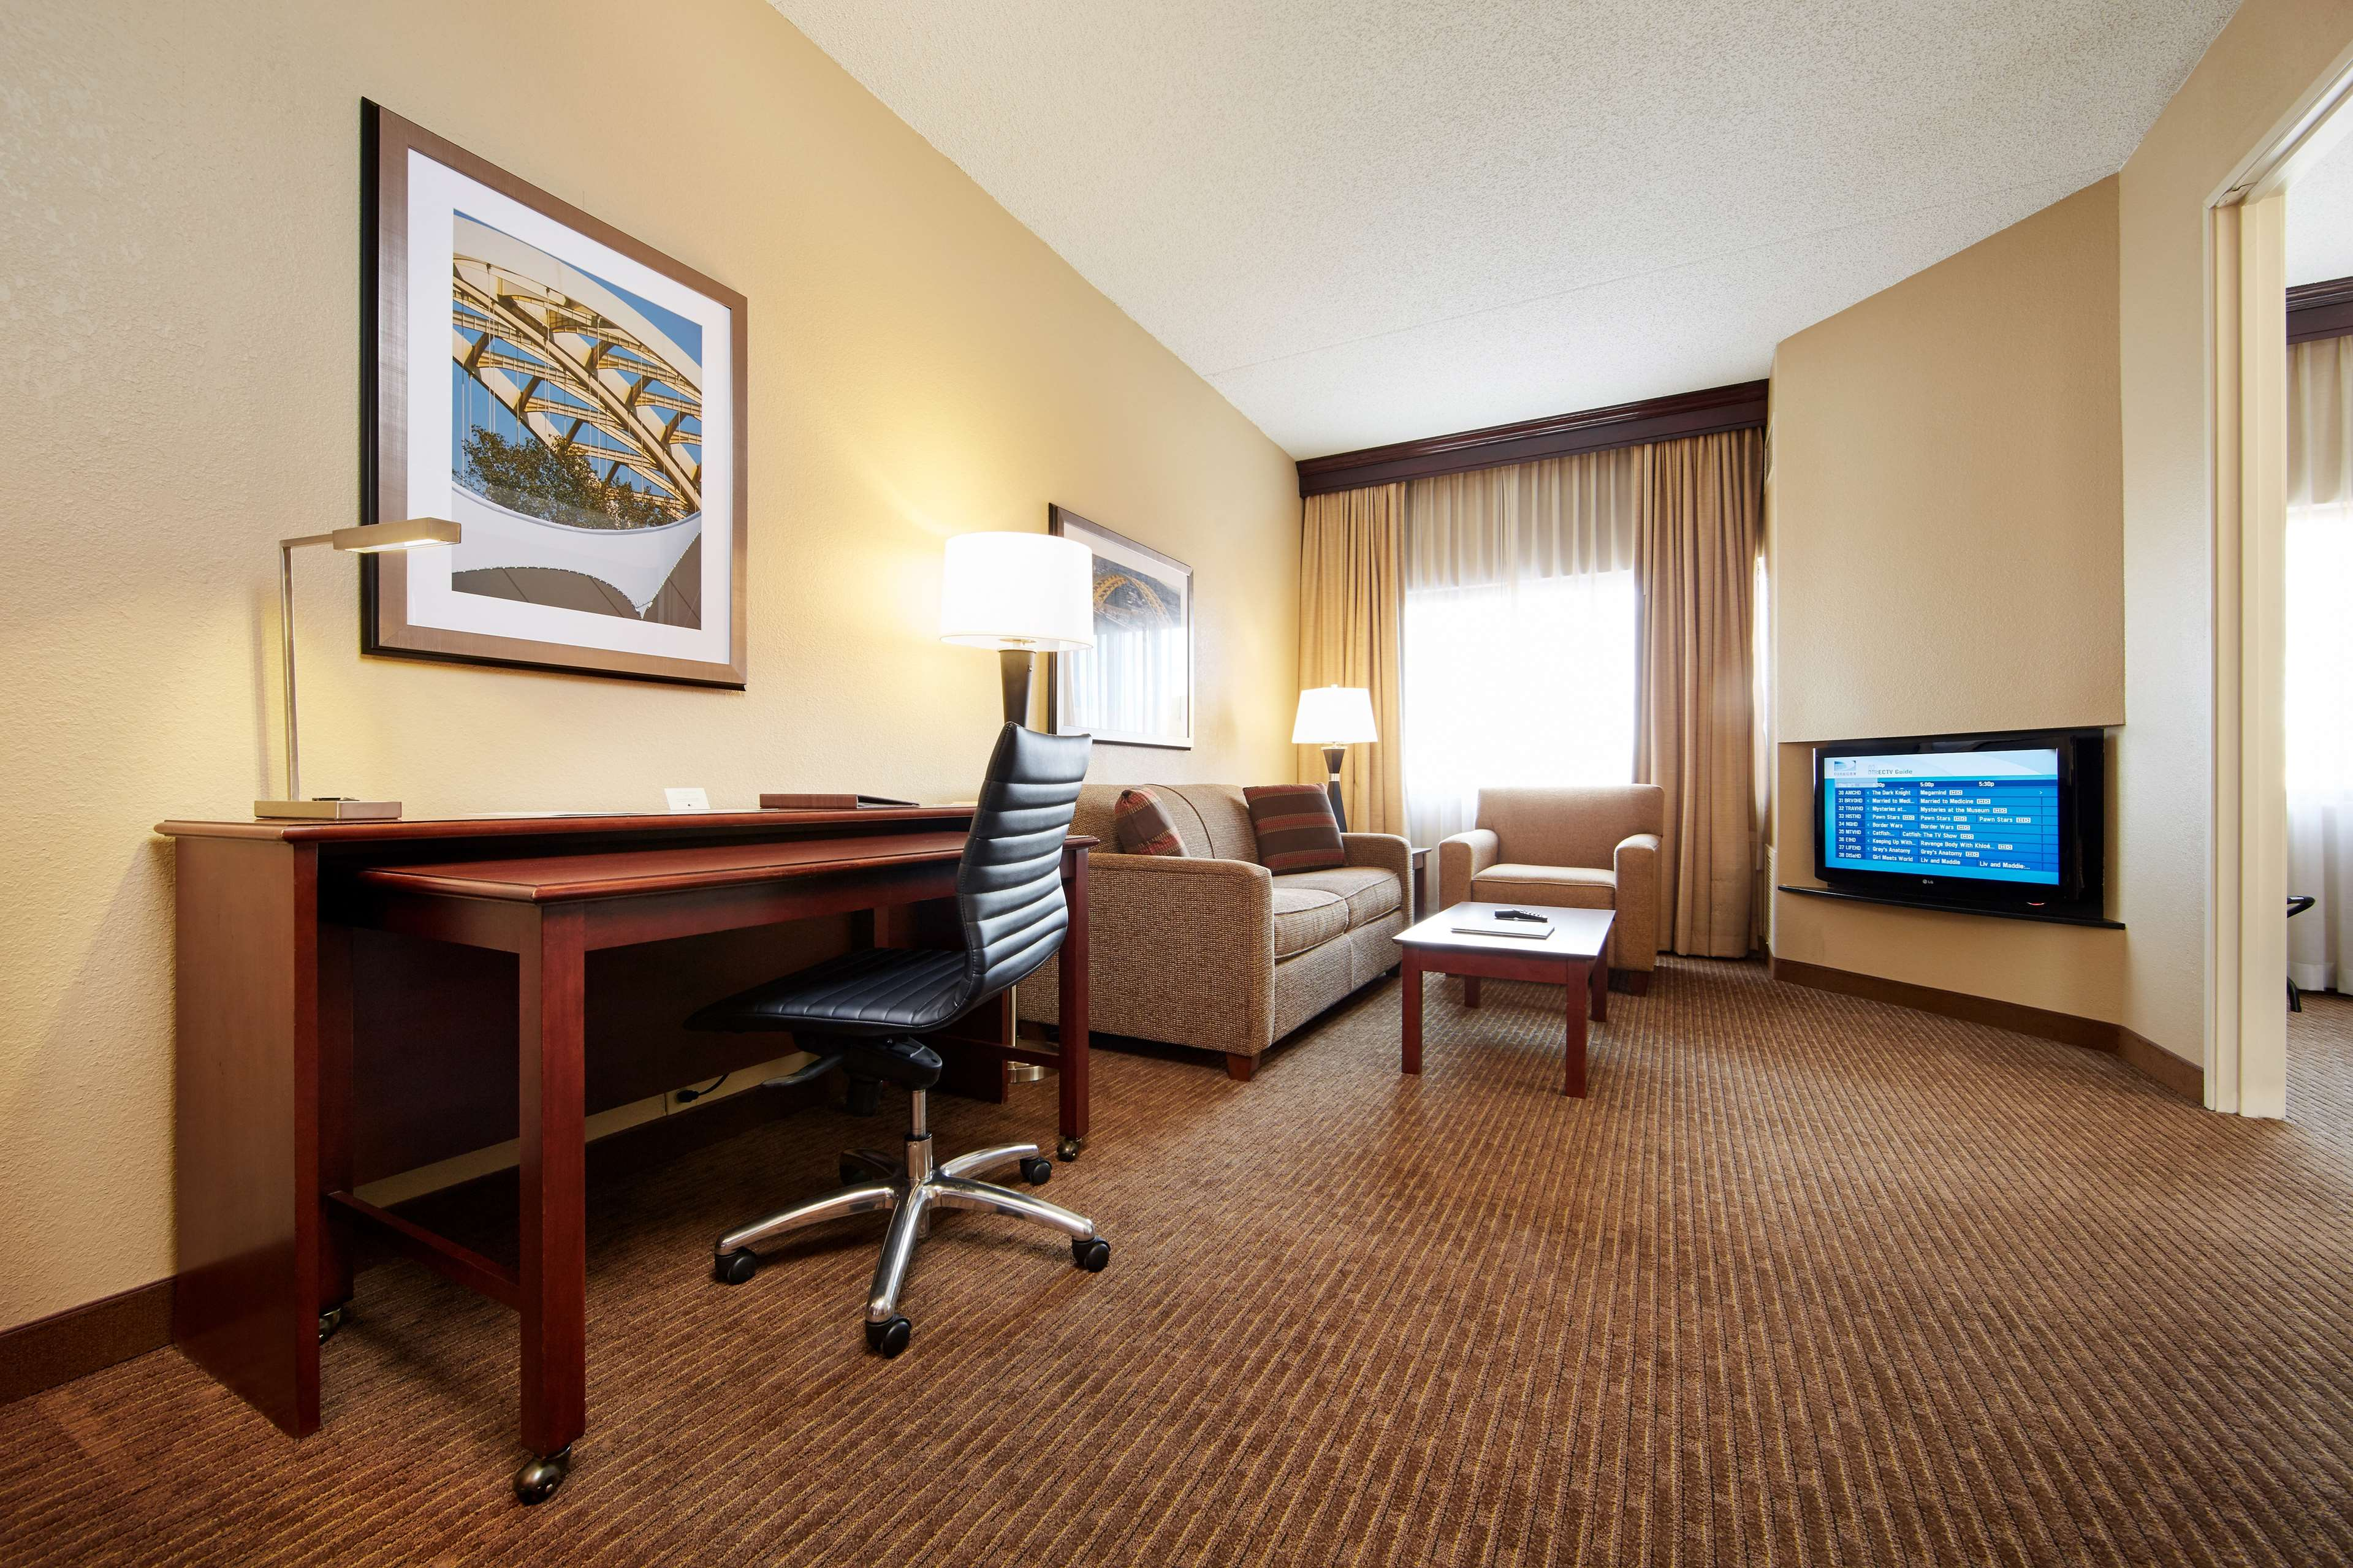 DoubleTree Suites by Hilton Hotel Cincinnati - Blue Ash image 21